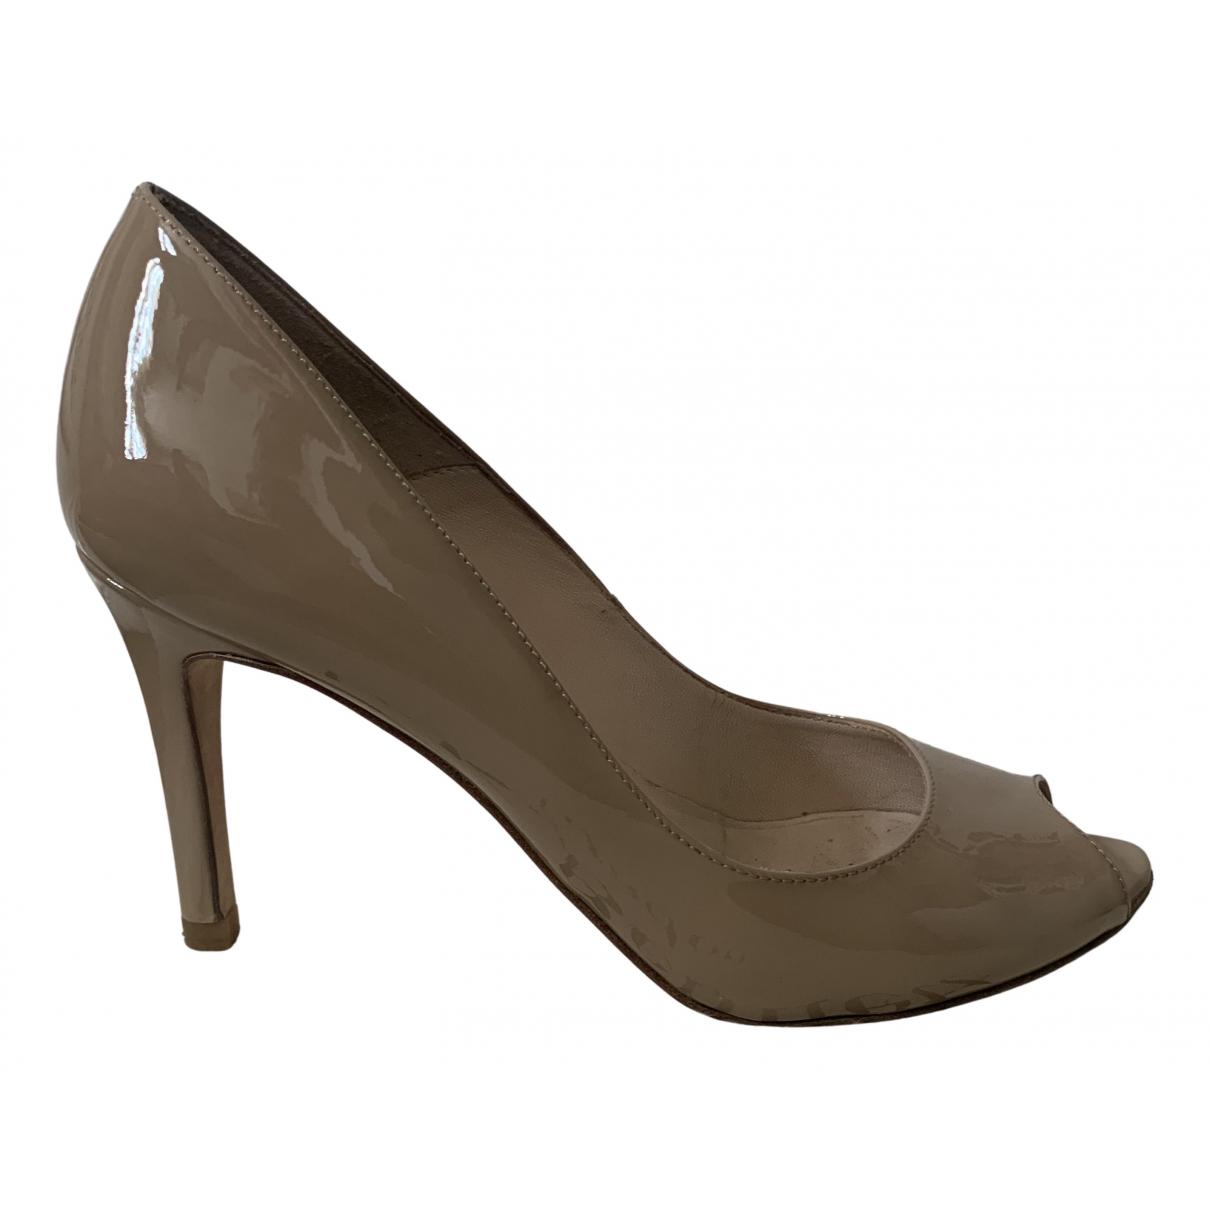 Lk Bennett N Beige Patent leather Heels for Women 4 UK